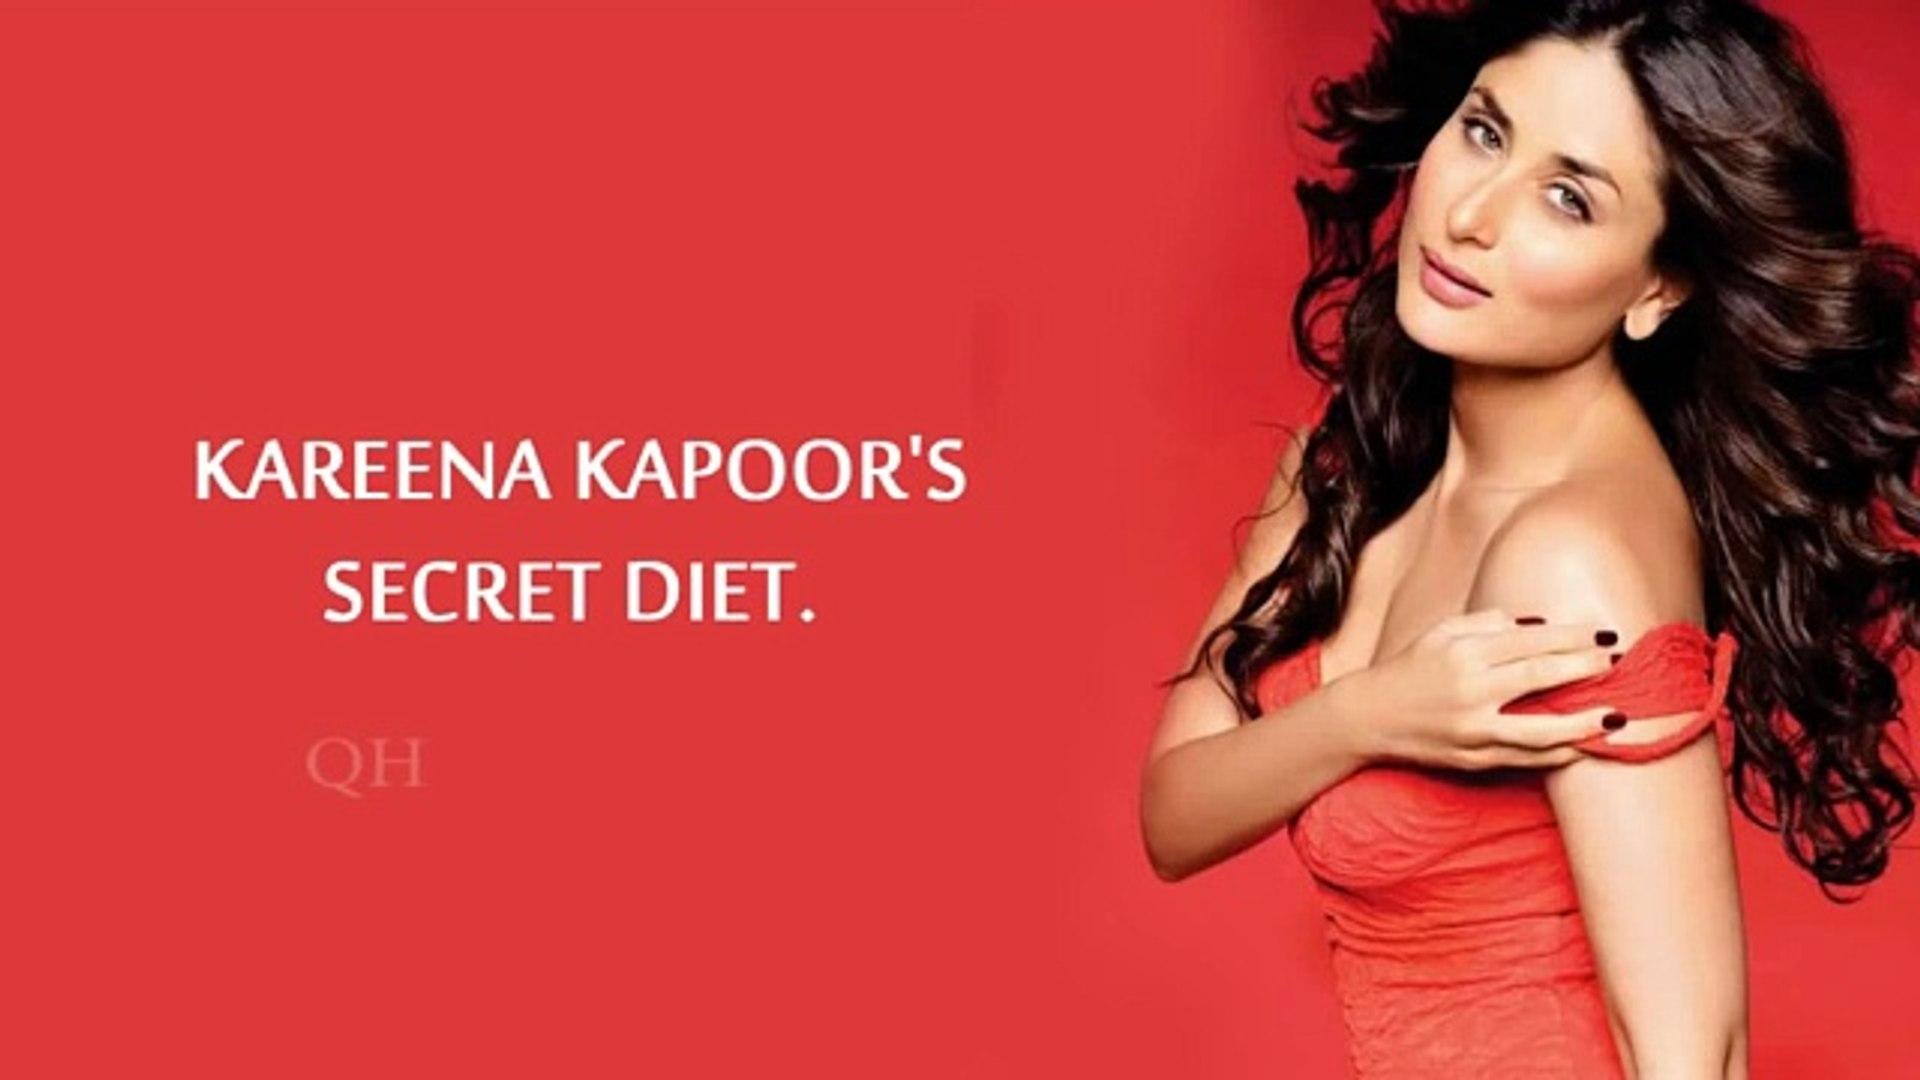 kareena kapoor's secret diet plan hitfit.pk